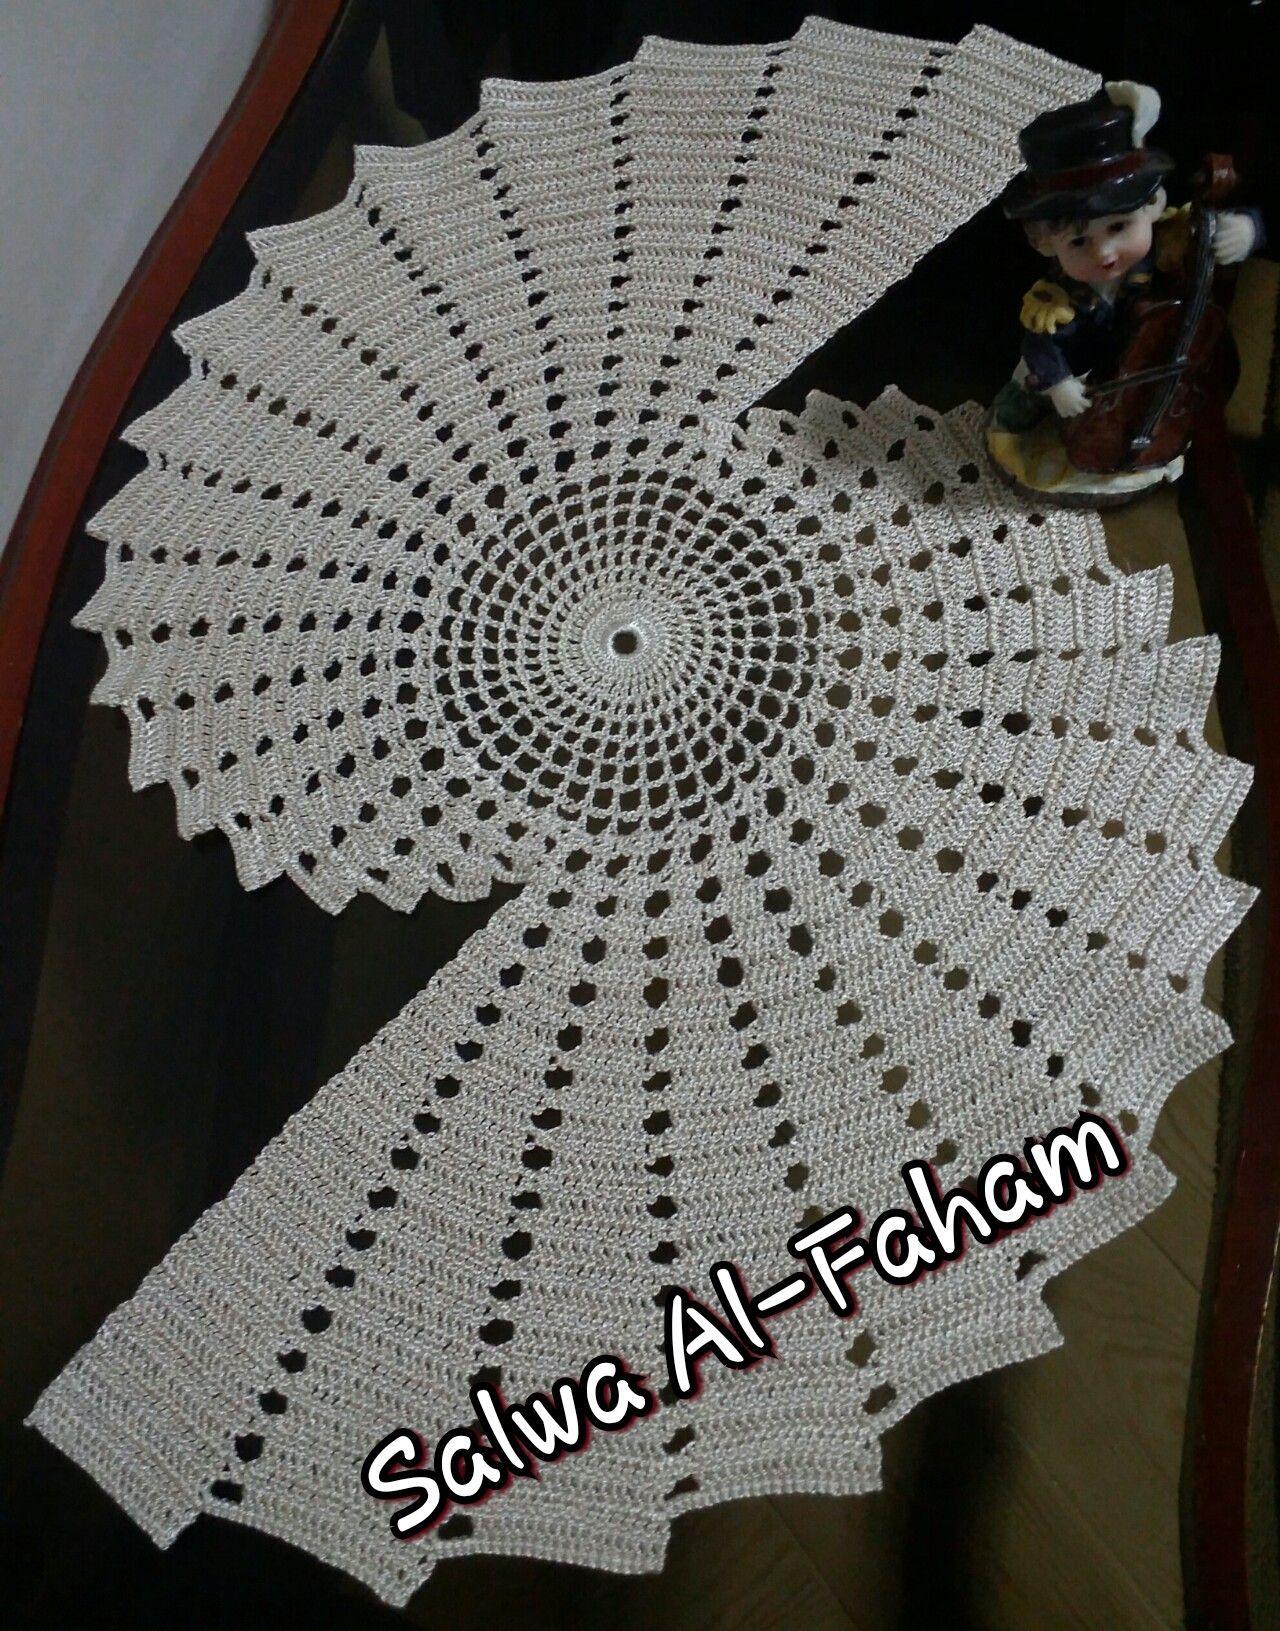 Crochet Doily كروشيه مفرش بخيط الصياد Crochet Doilies Crochet Doilies